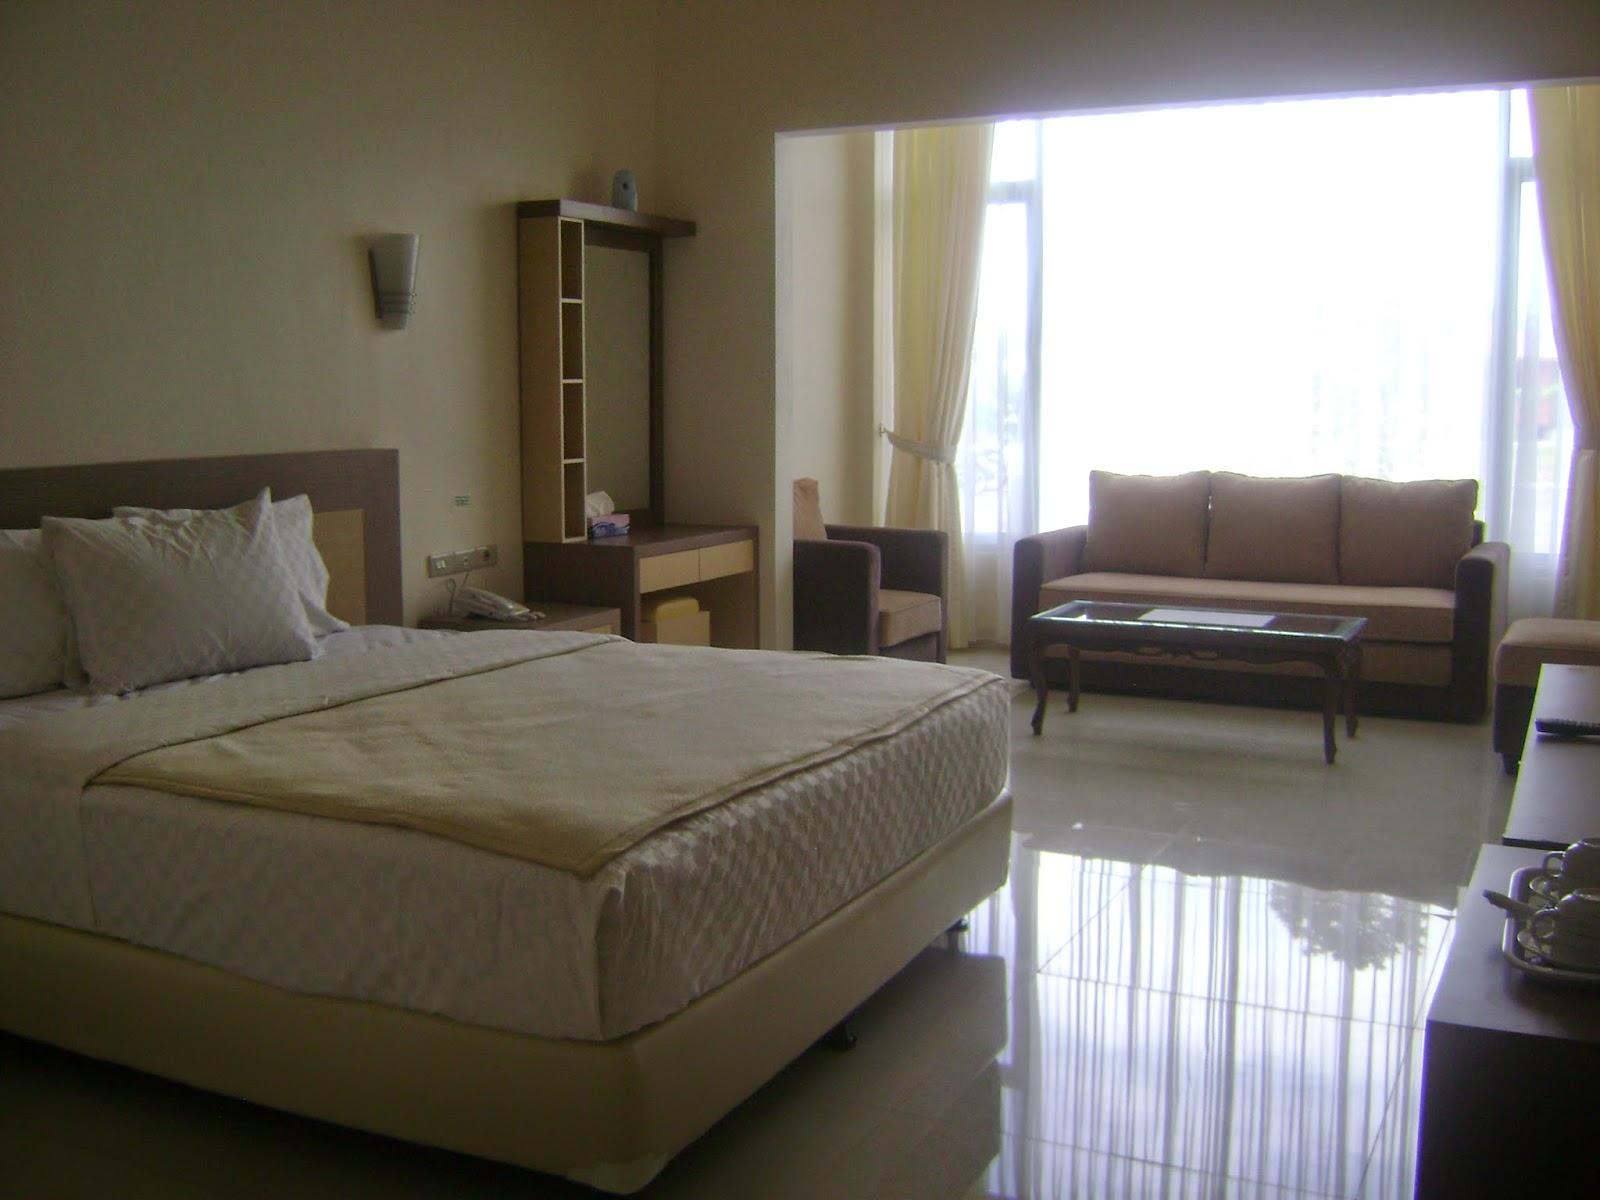 negeri baru resort pilihan wisata keluarga barometer lampung rh barometerlampung blogspot com